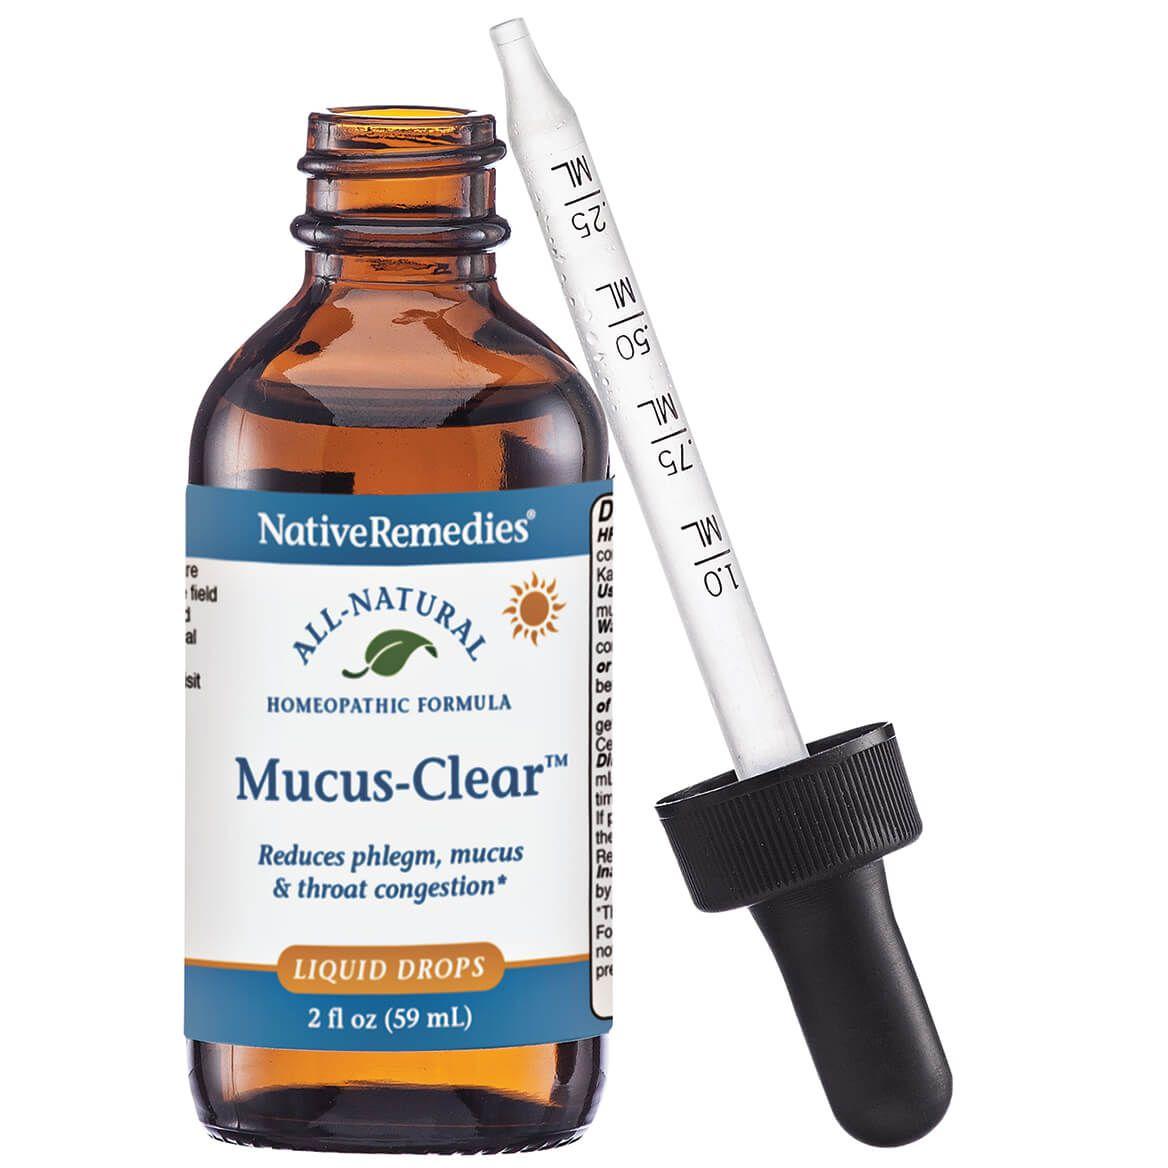 NativeRemedies®Mucus-Clear™-343693